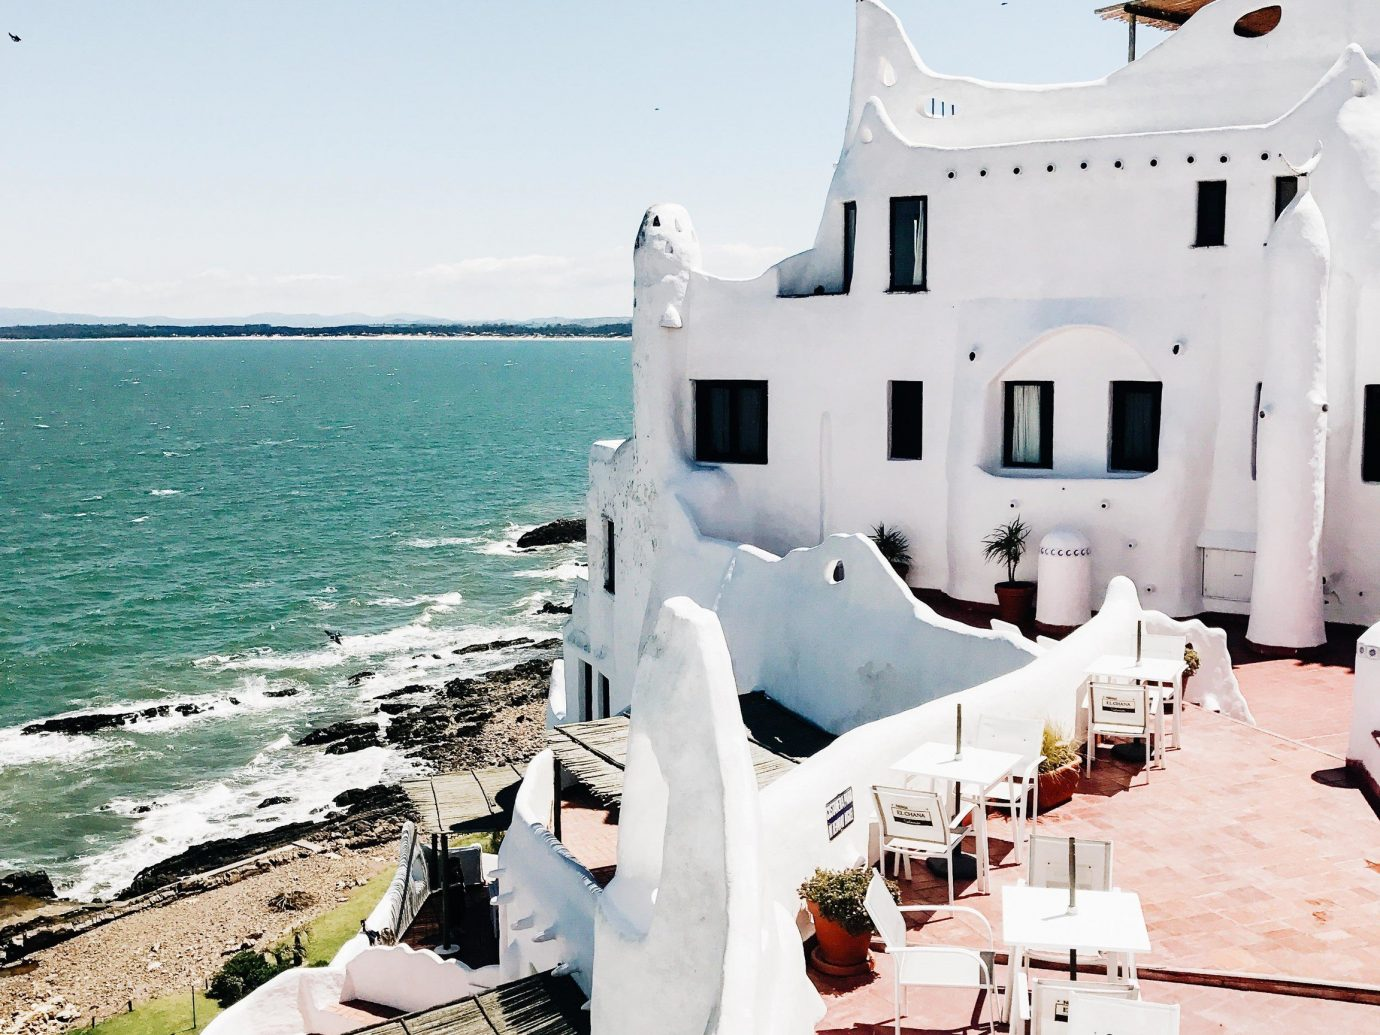 Romantic Getaways south america Trip Ideas Uruguay property Sea Resort vacation sky home tourism apartment hotel Beach